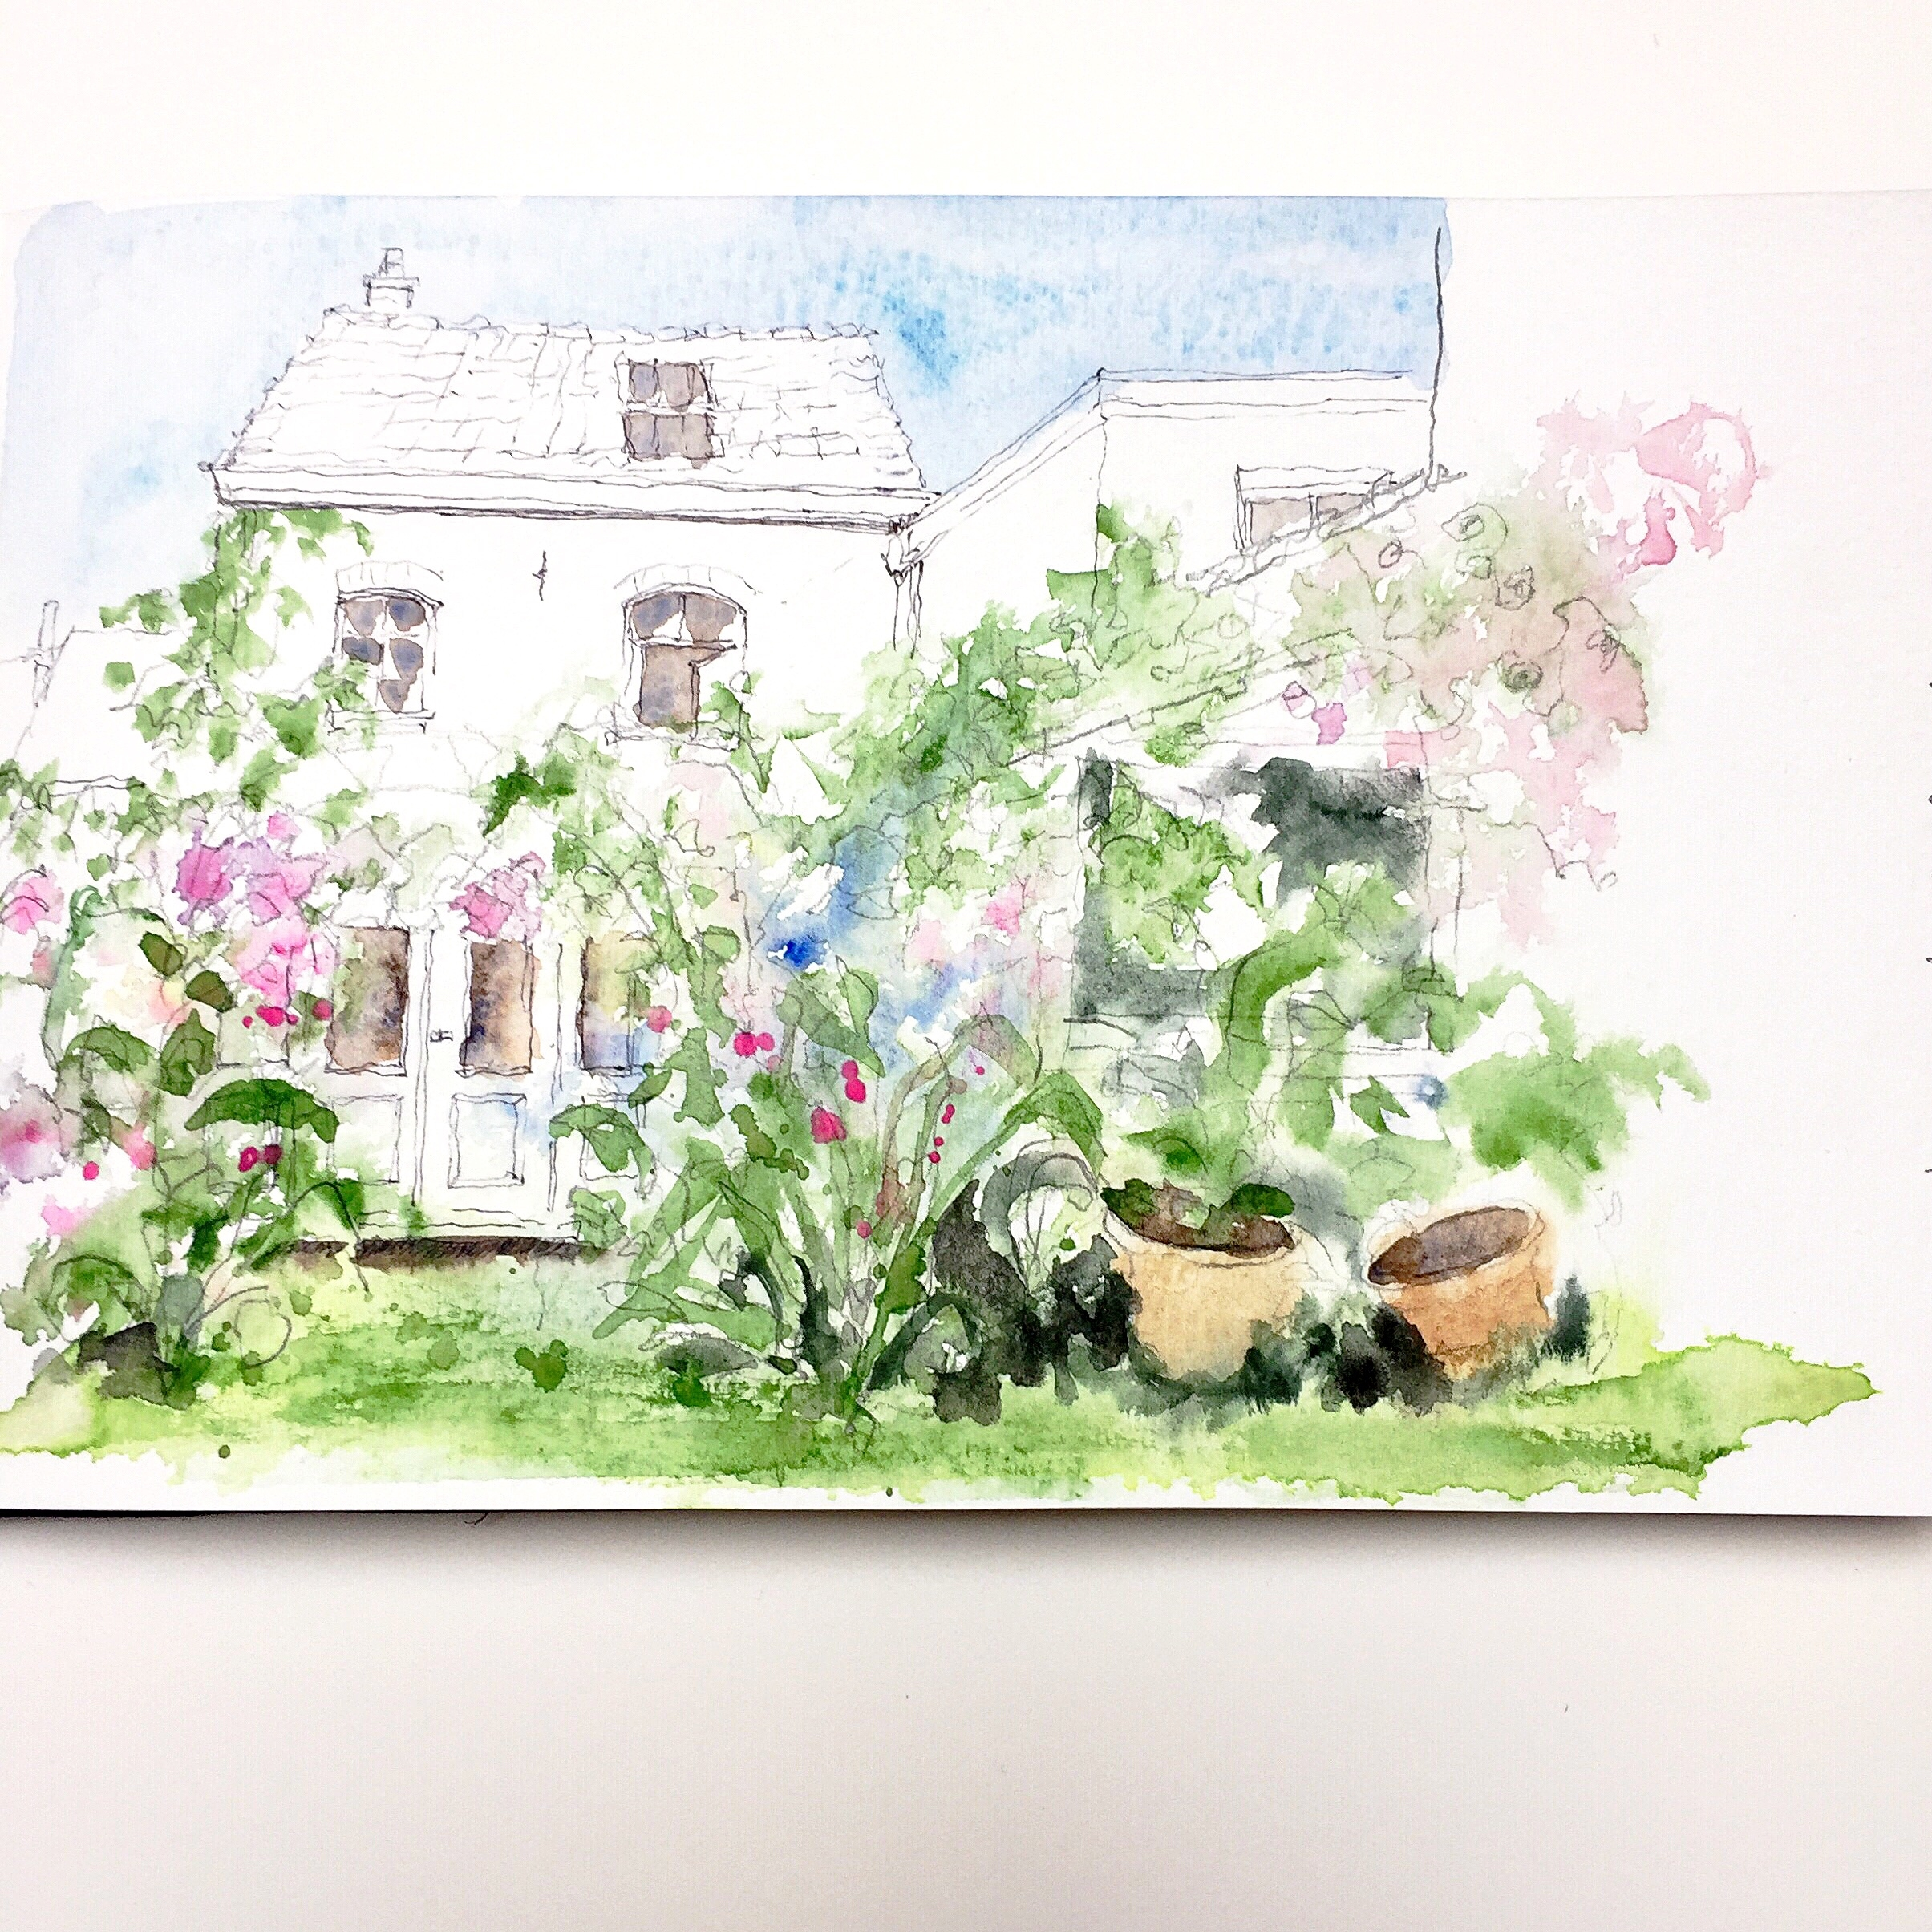 le jardin de Cécilia